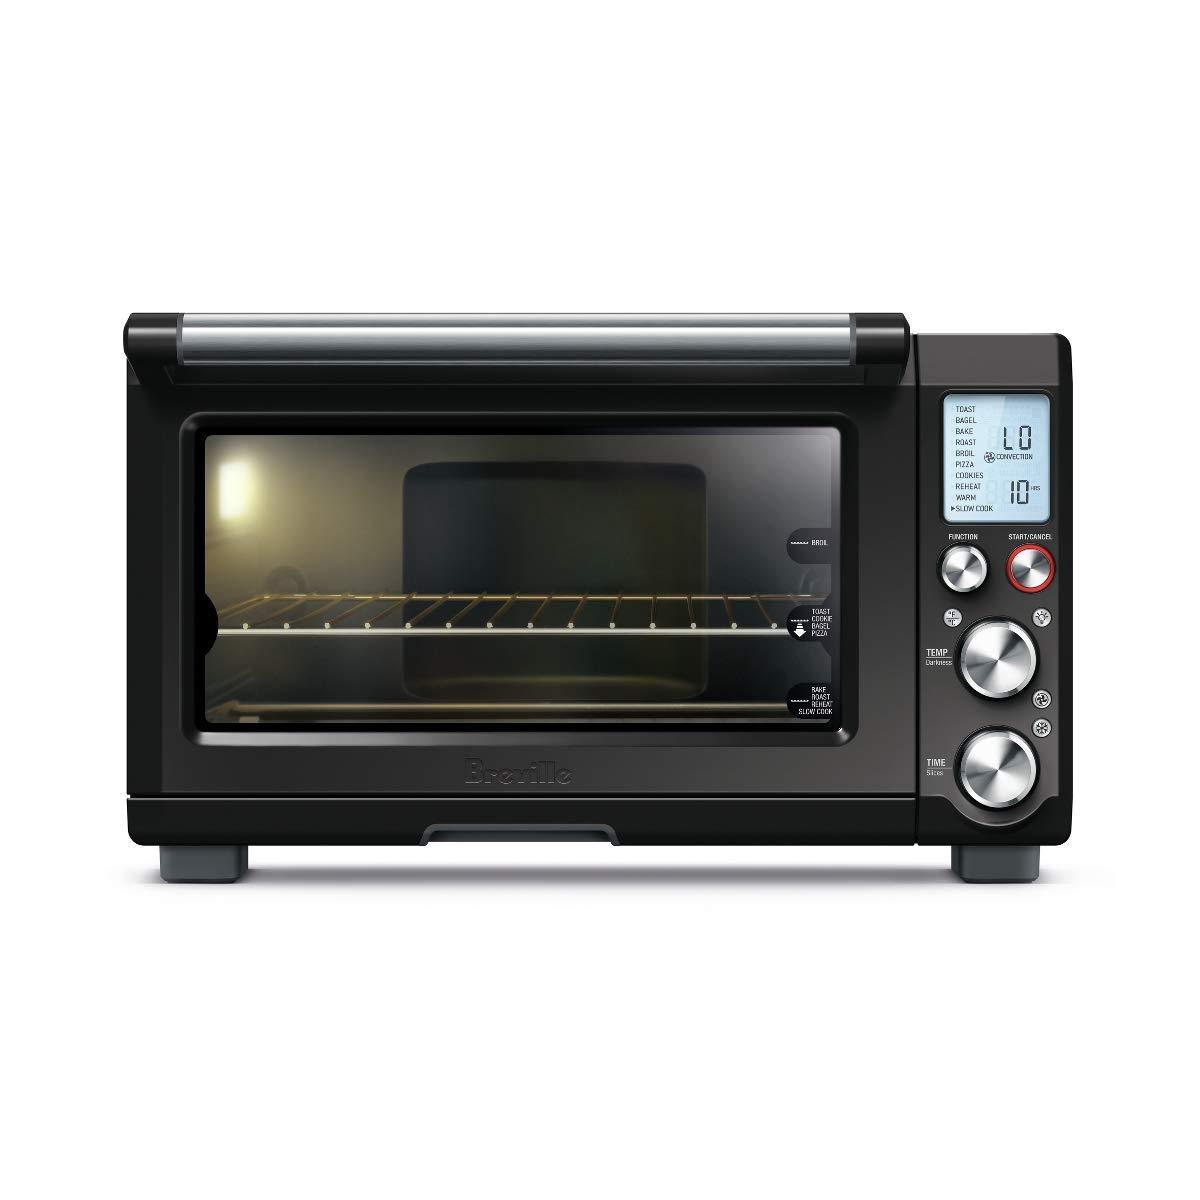 Breville the Smart Oven Pro Toaster Convection Oven - Black Sesame - BOV845